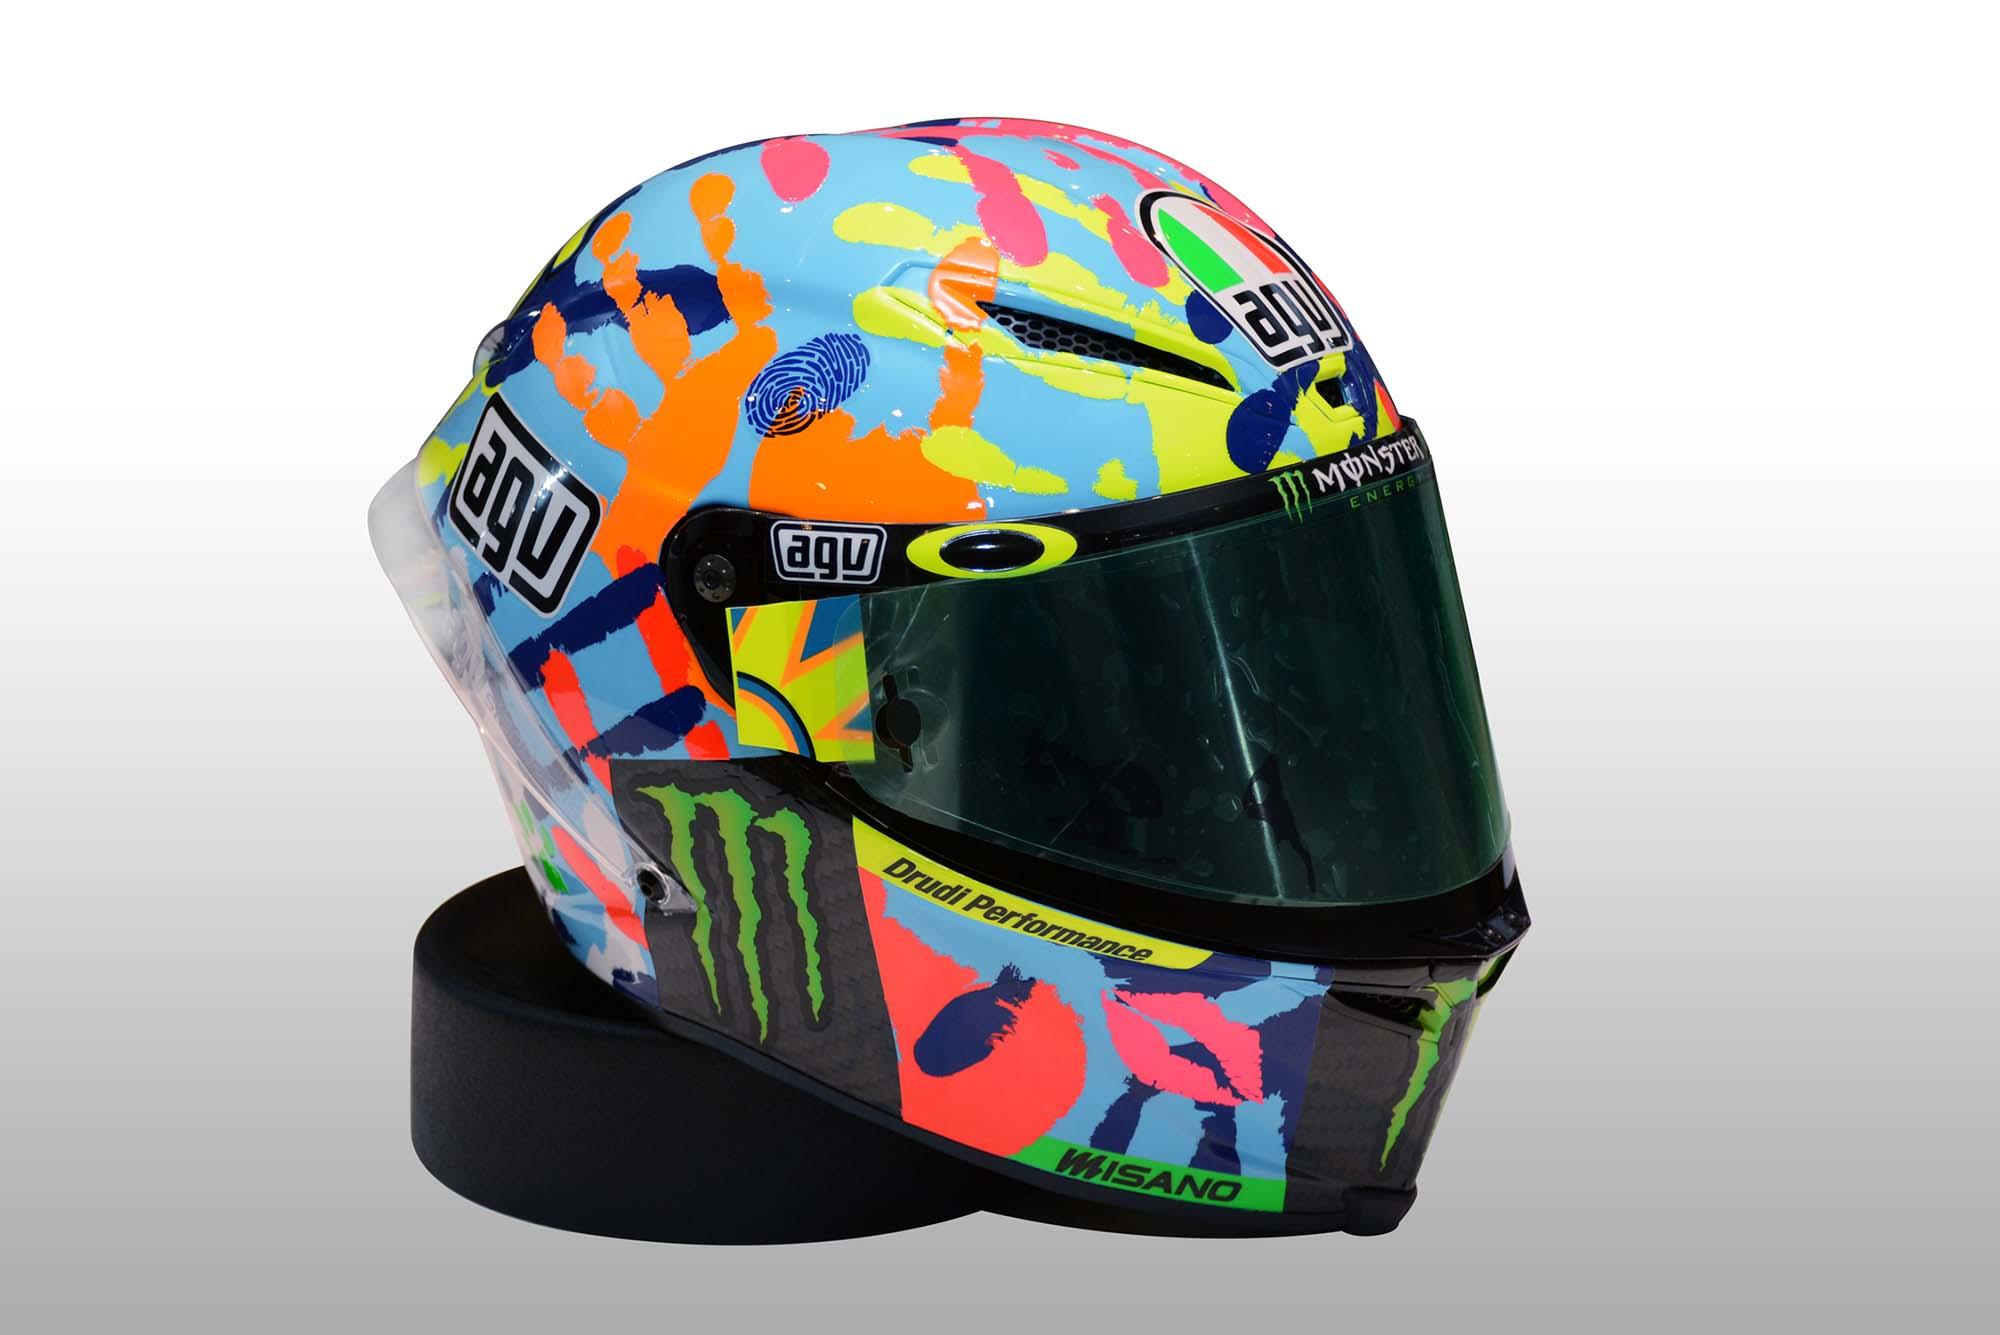 AGV Helmet MotoGP 2014 (Valentino Rossi) | eBay